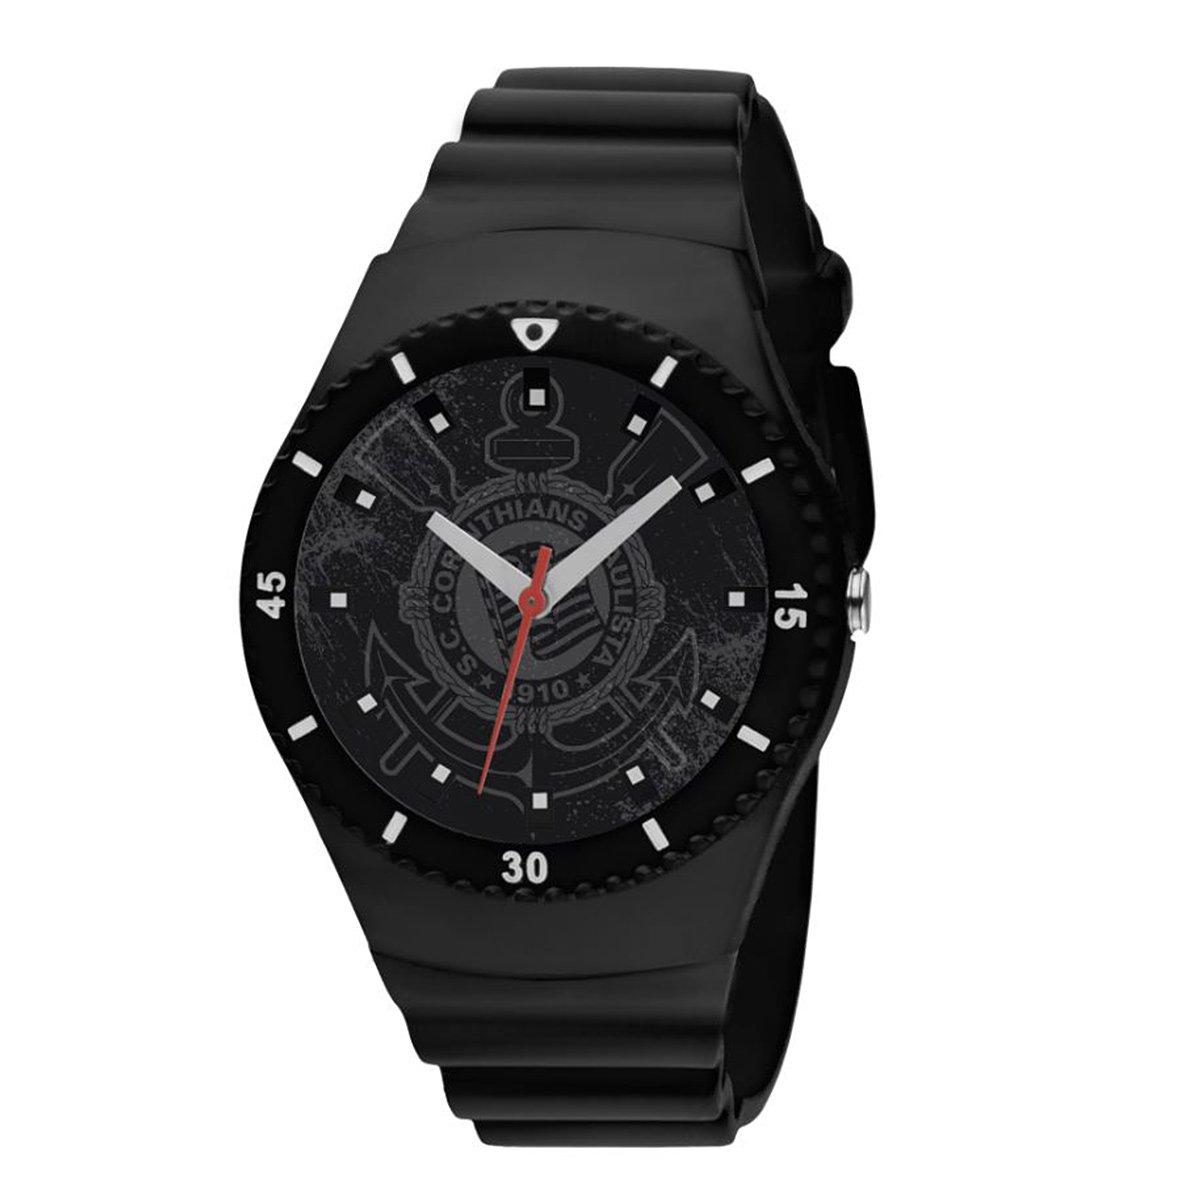 bc2a3f6814a Relógio Corinthians Technos Analógico - Compre Agora